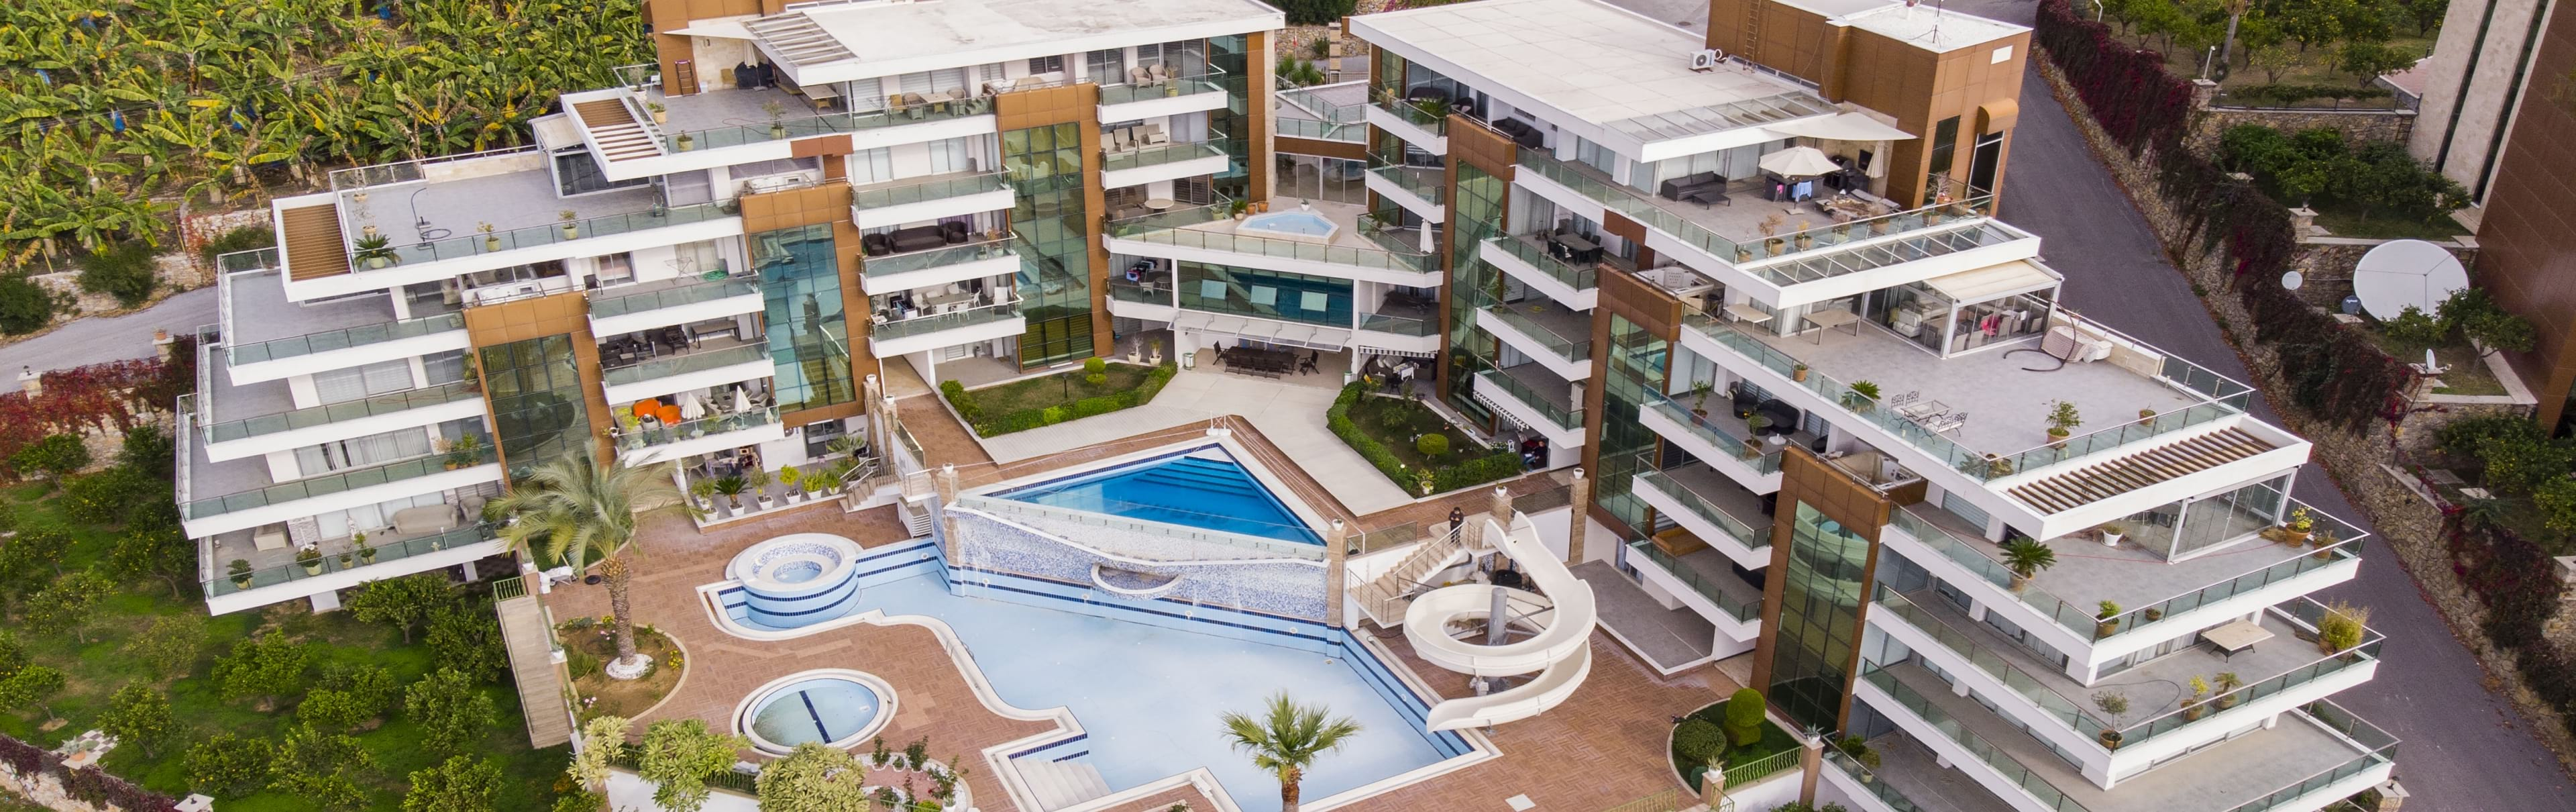 Aramis Terrace 1 bedroom apartment